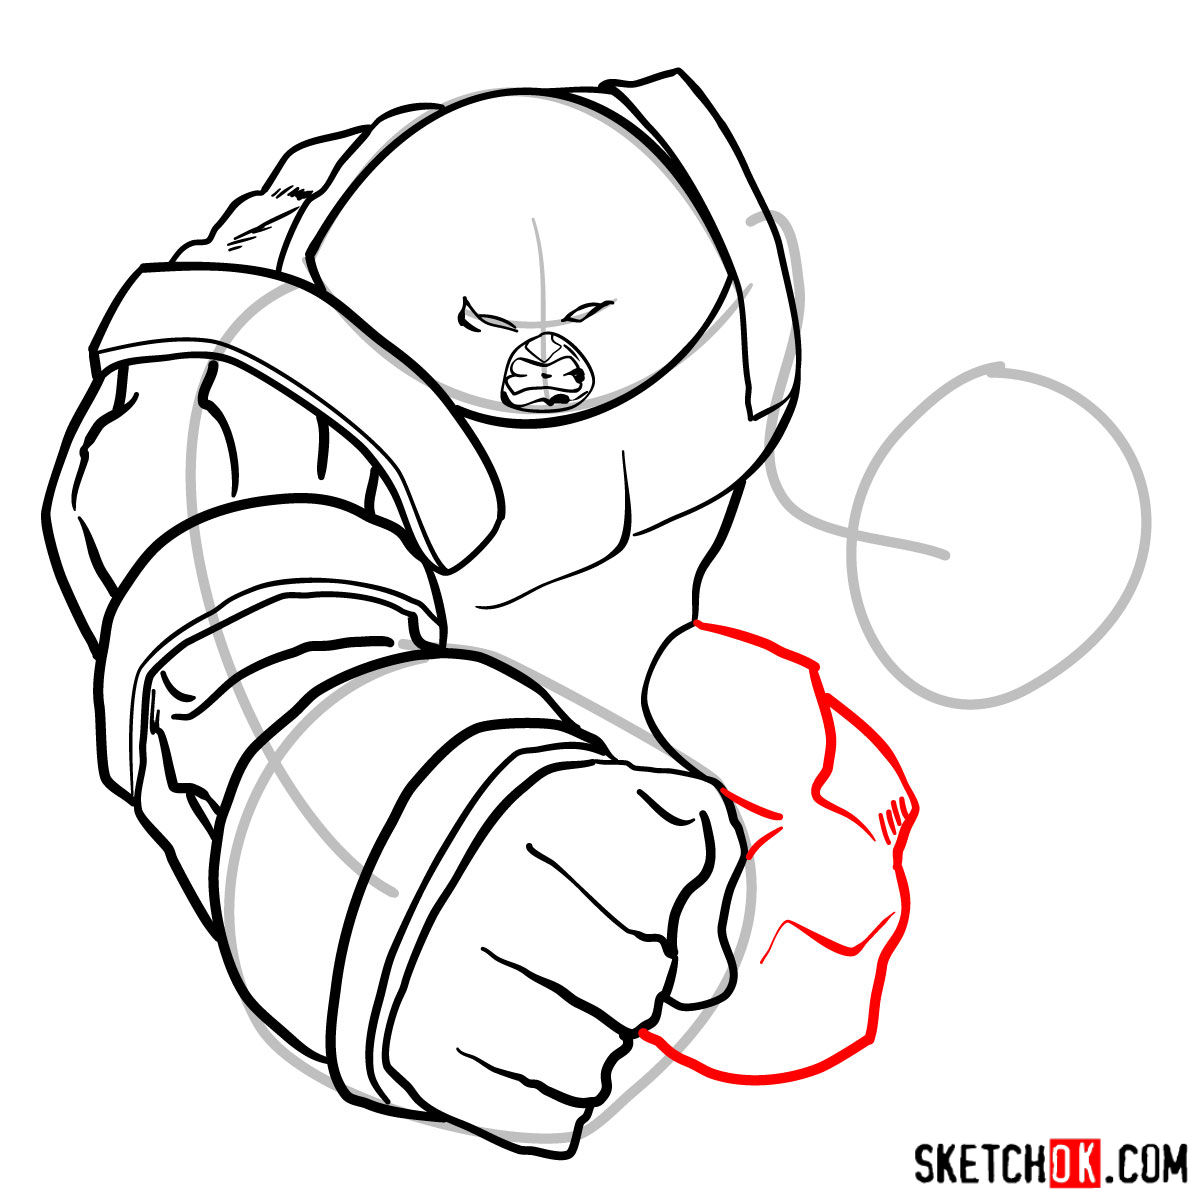 How to draw Juggernaut, the villian from X-Men series - step 10